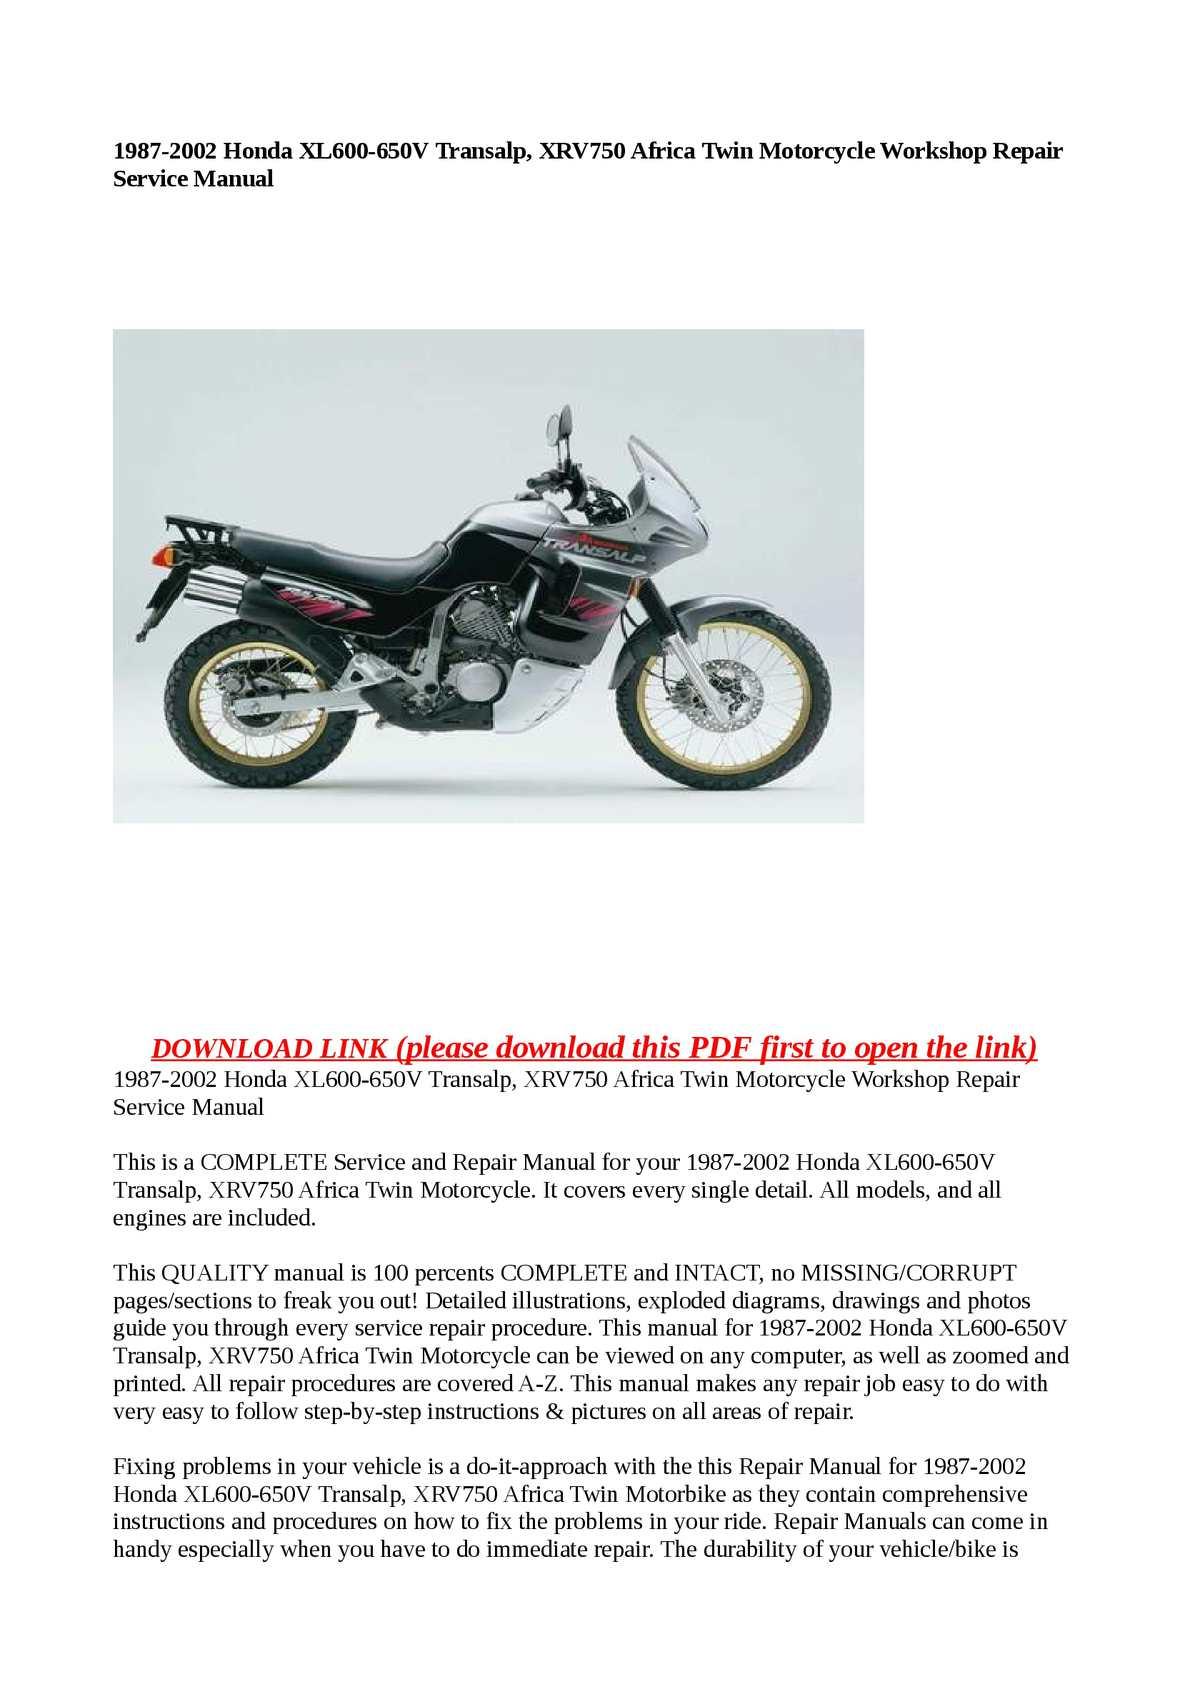 Calaméo - 1987-2002 Honda XL600-650V Transalp, XRV750 Africa Twin  Motorcycle Workshop Repair Service Manual